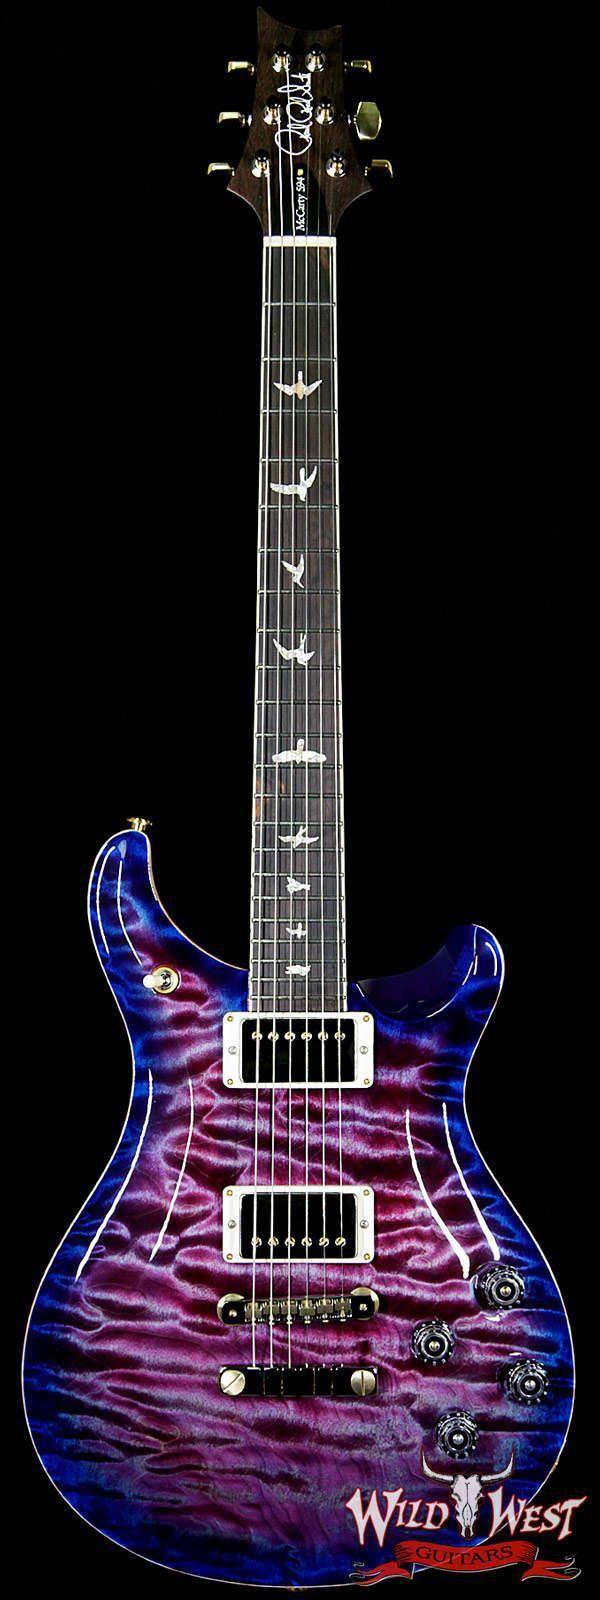 PRS Guitars Strap PRS Guitar Poster #guitarvideo #guitar #PRSGuitars #prsguitar